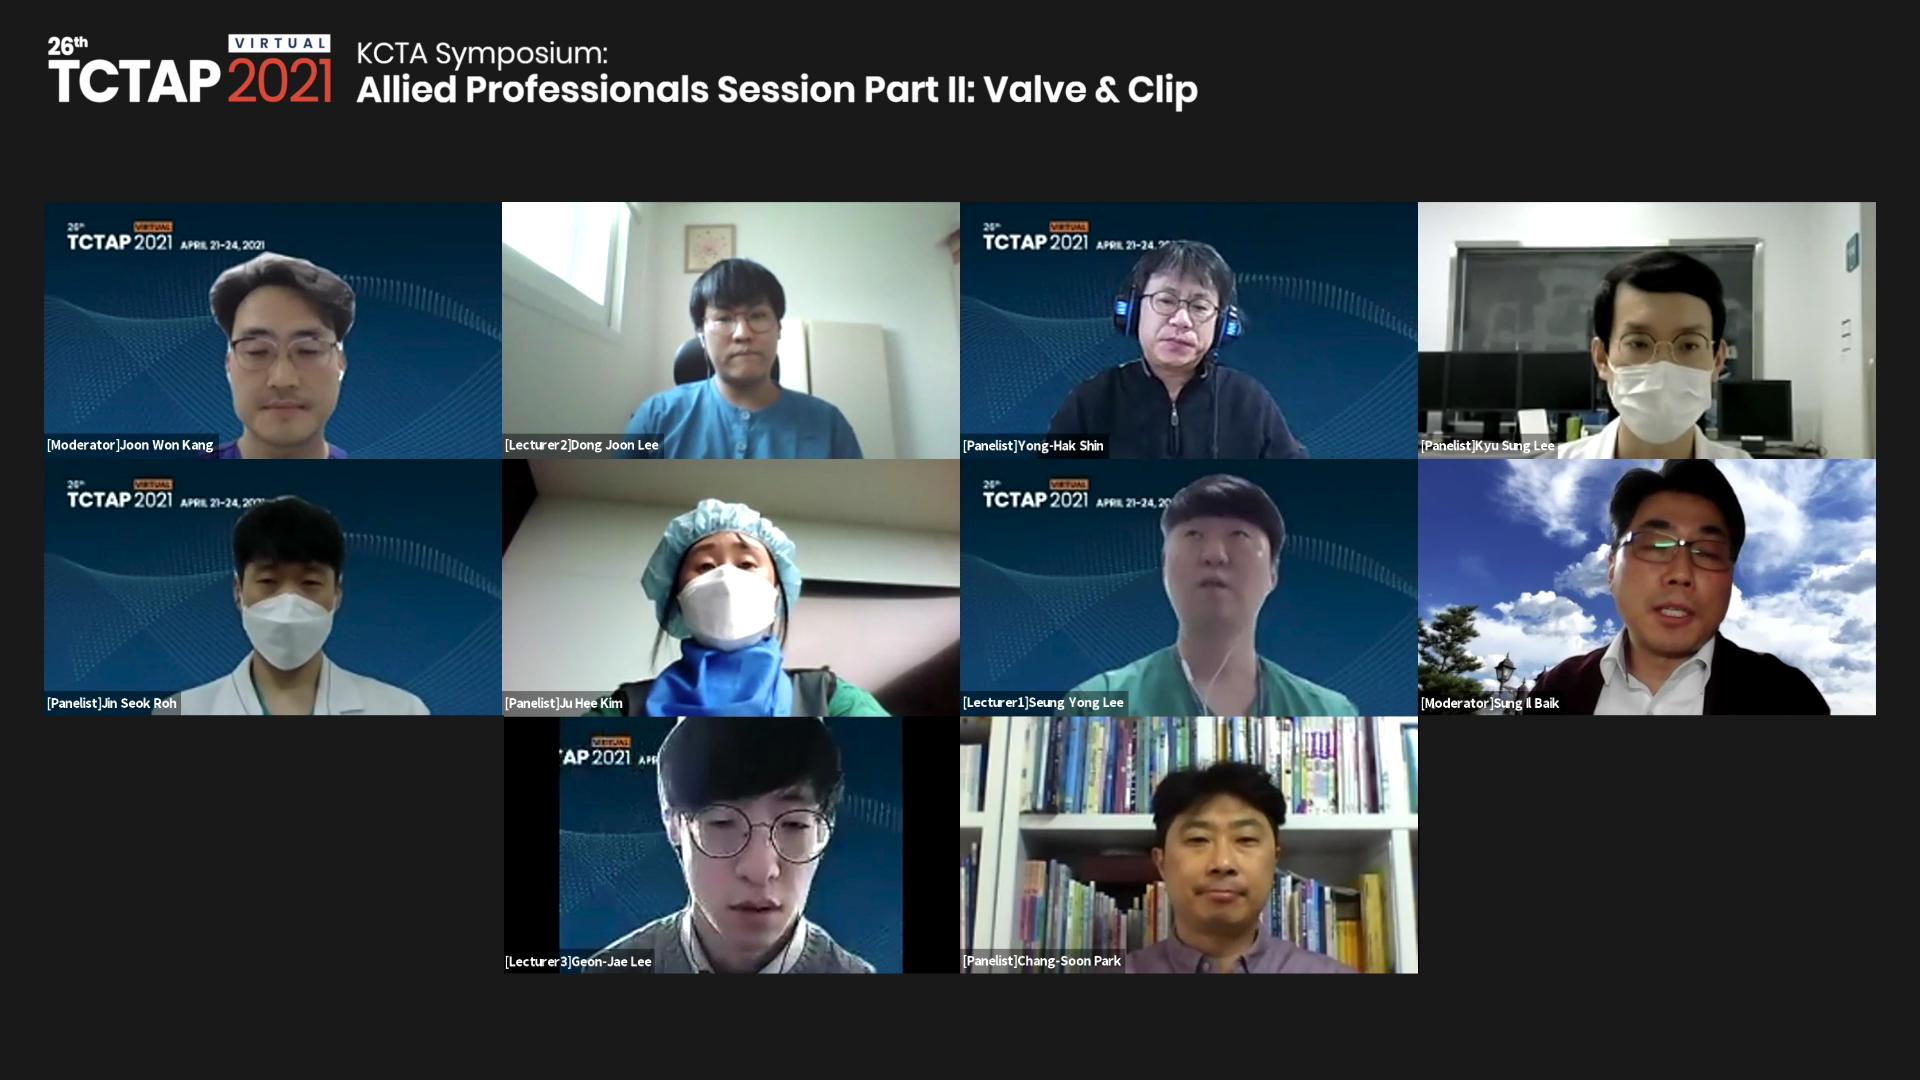 [TCTAP 2021 Virtual] KCTA Symposium: Allied Professionals Session - Part II: Valve & Clip